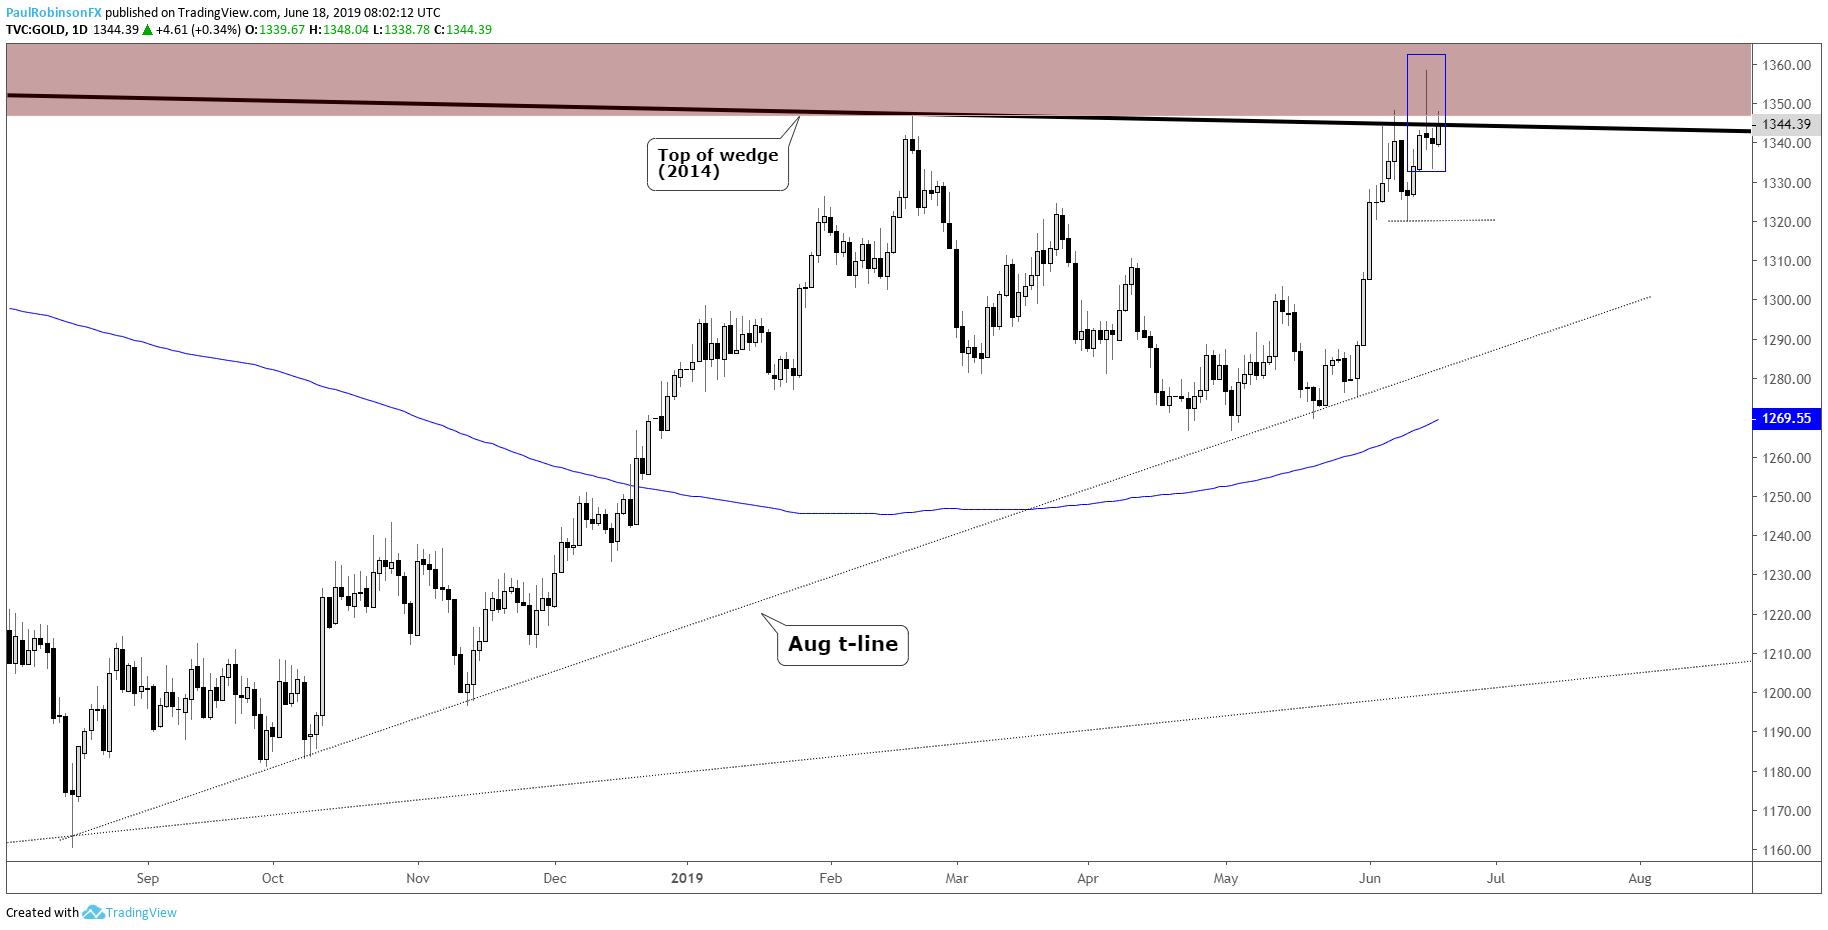 Forex bullion gold price